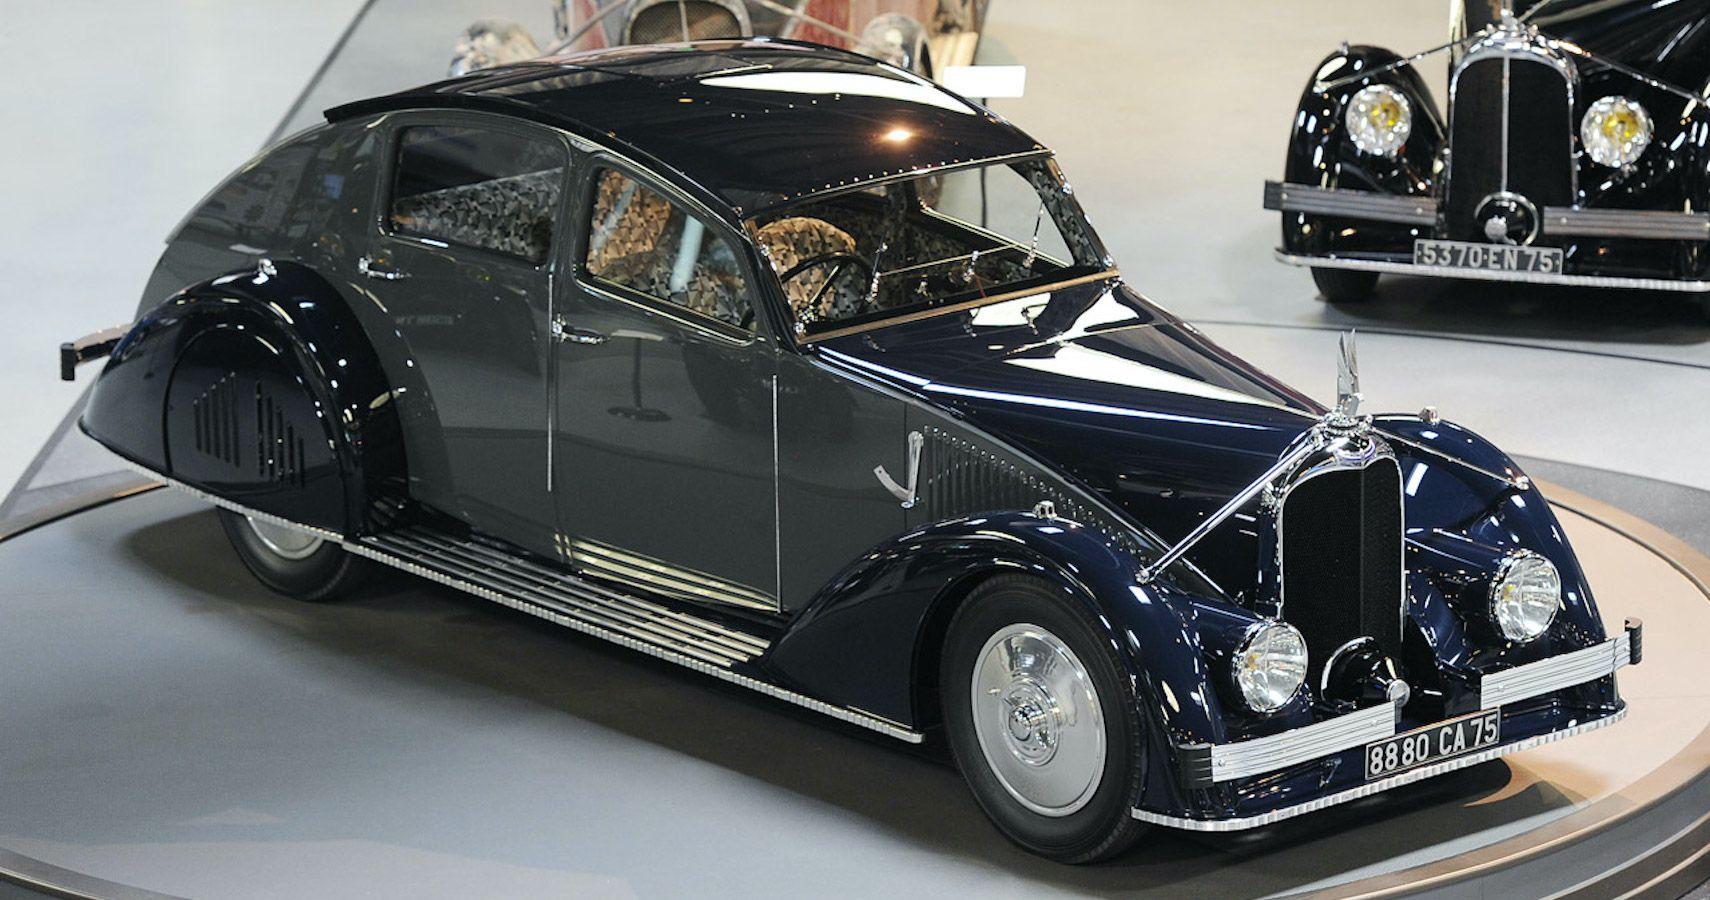 Mullin Museum Premieres Episode Of Docent Series On 1935 Voisin Type C25 Aerodyne